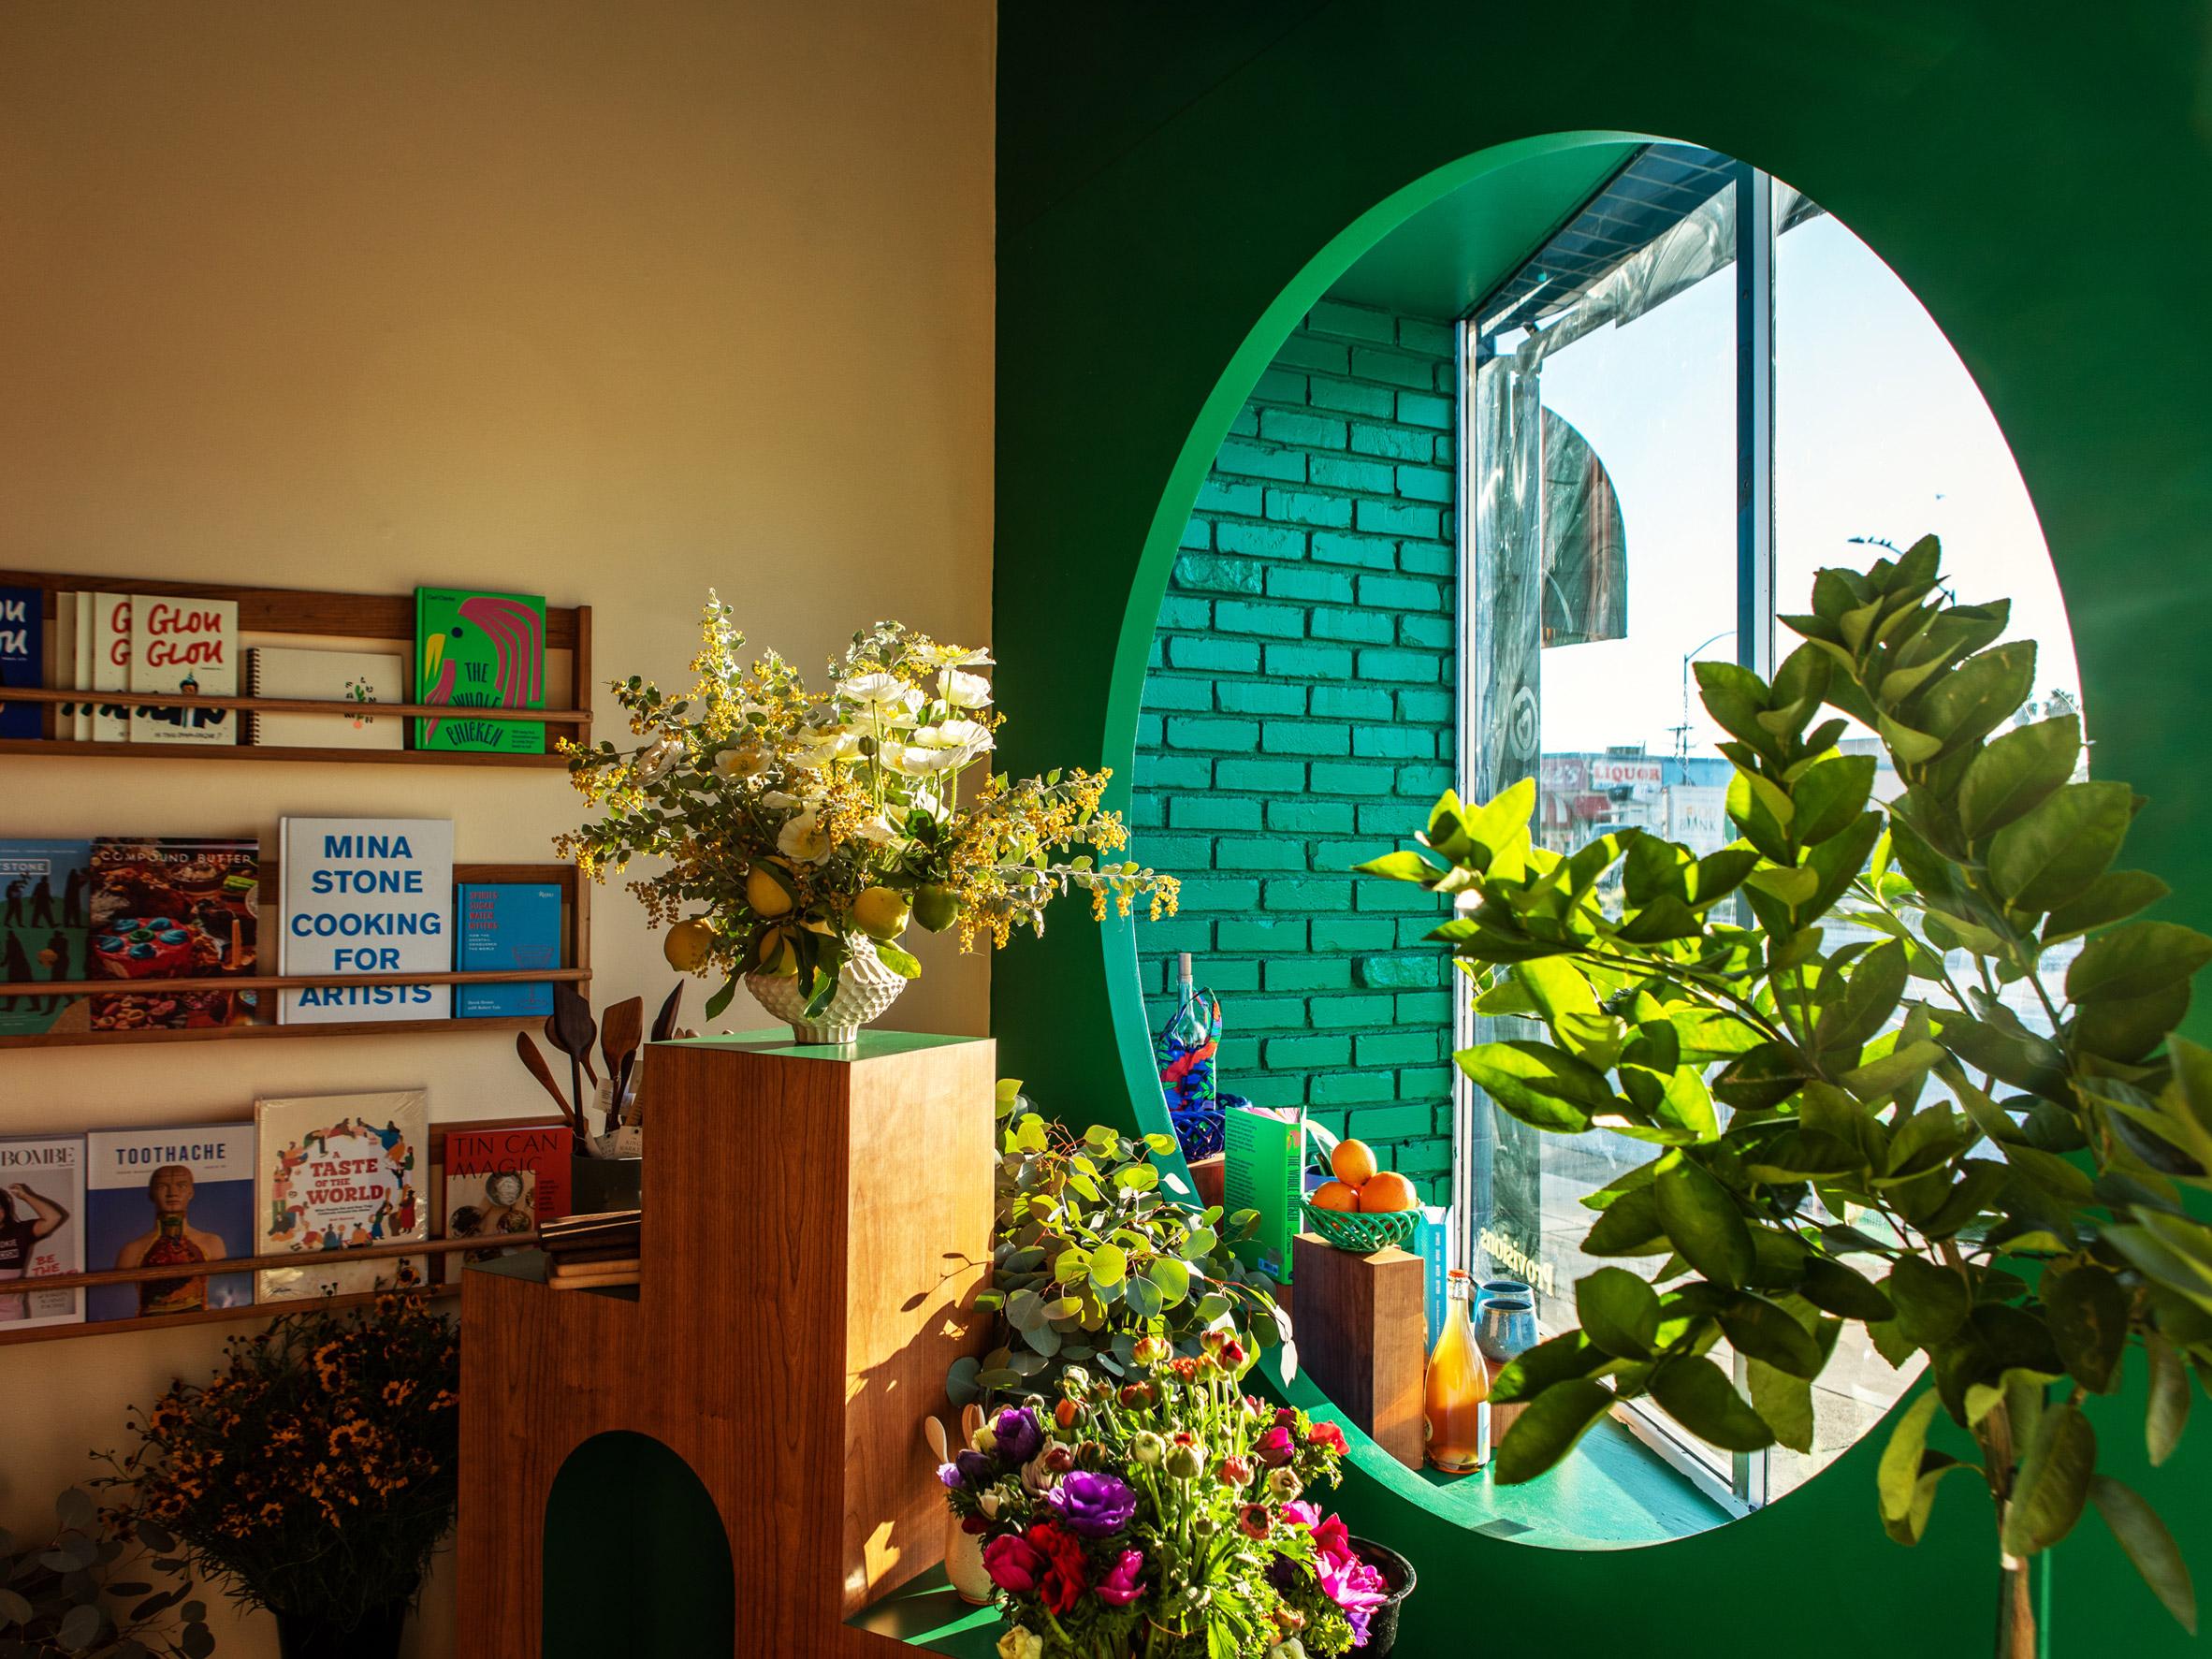 Green circular window in grocery store